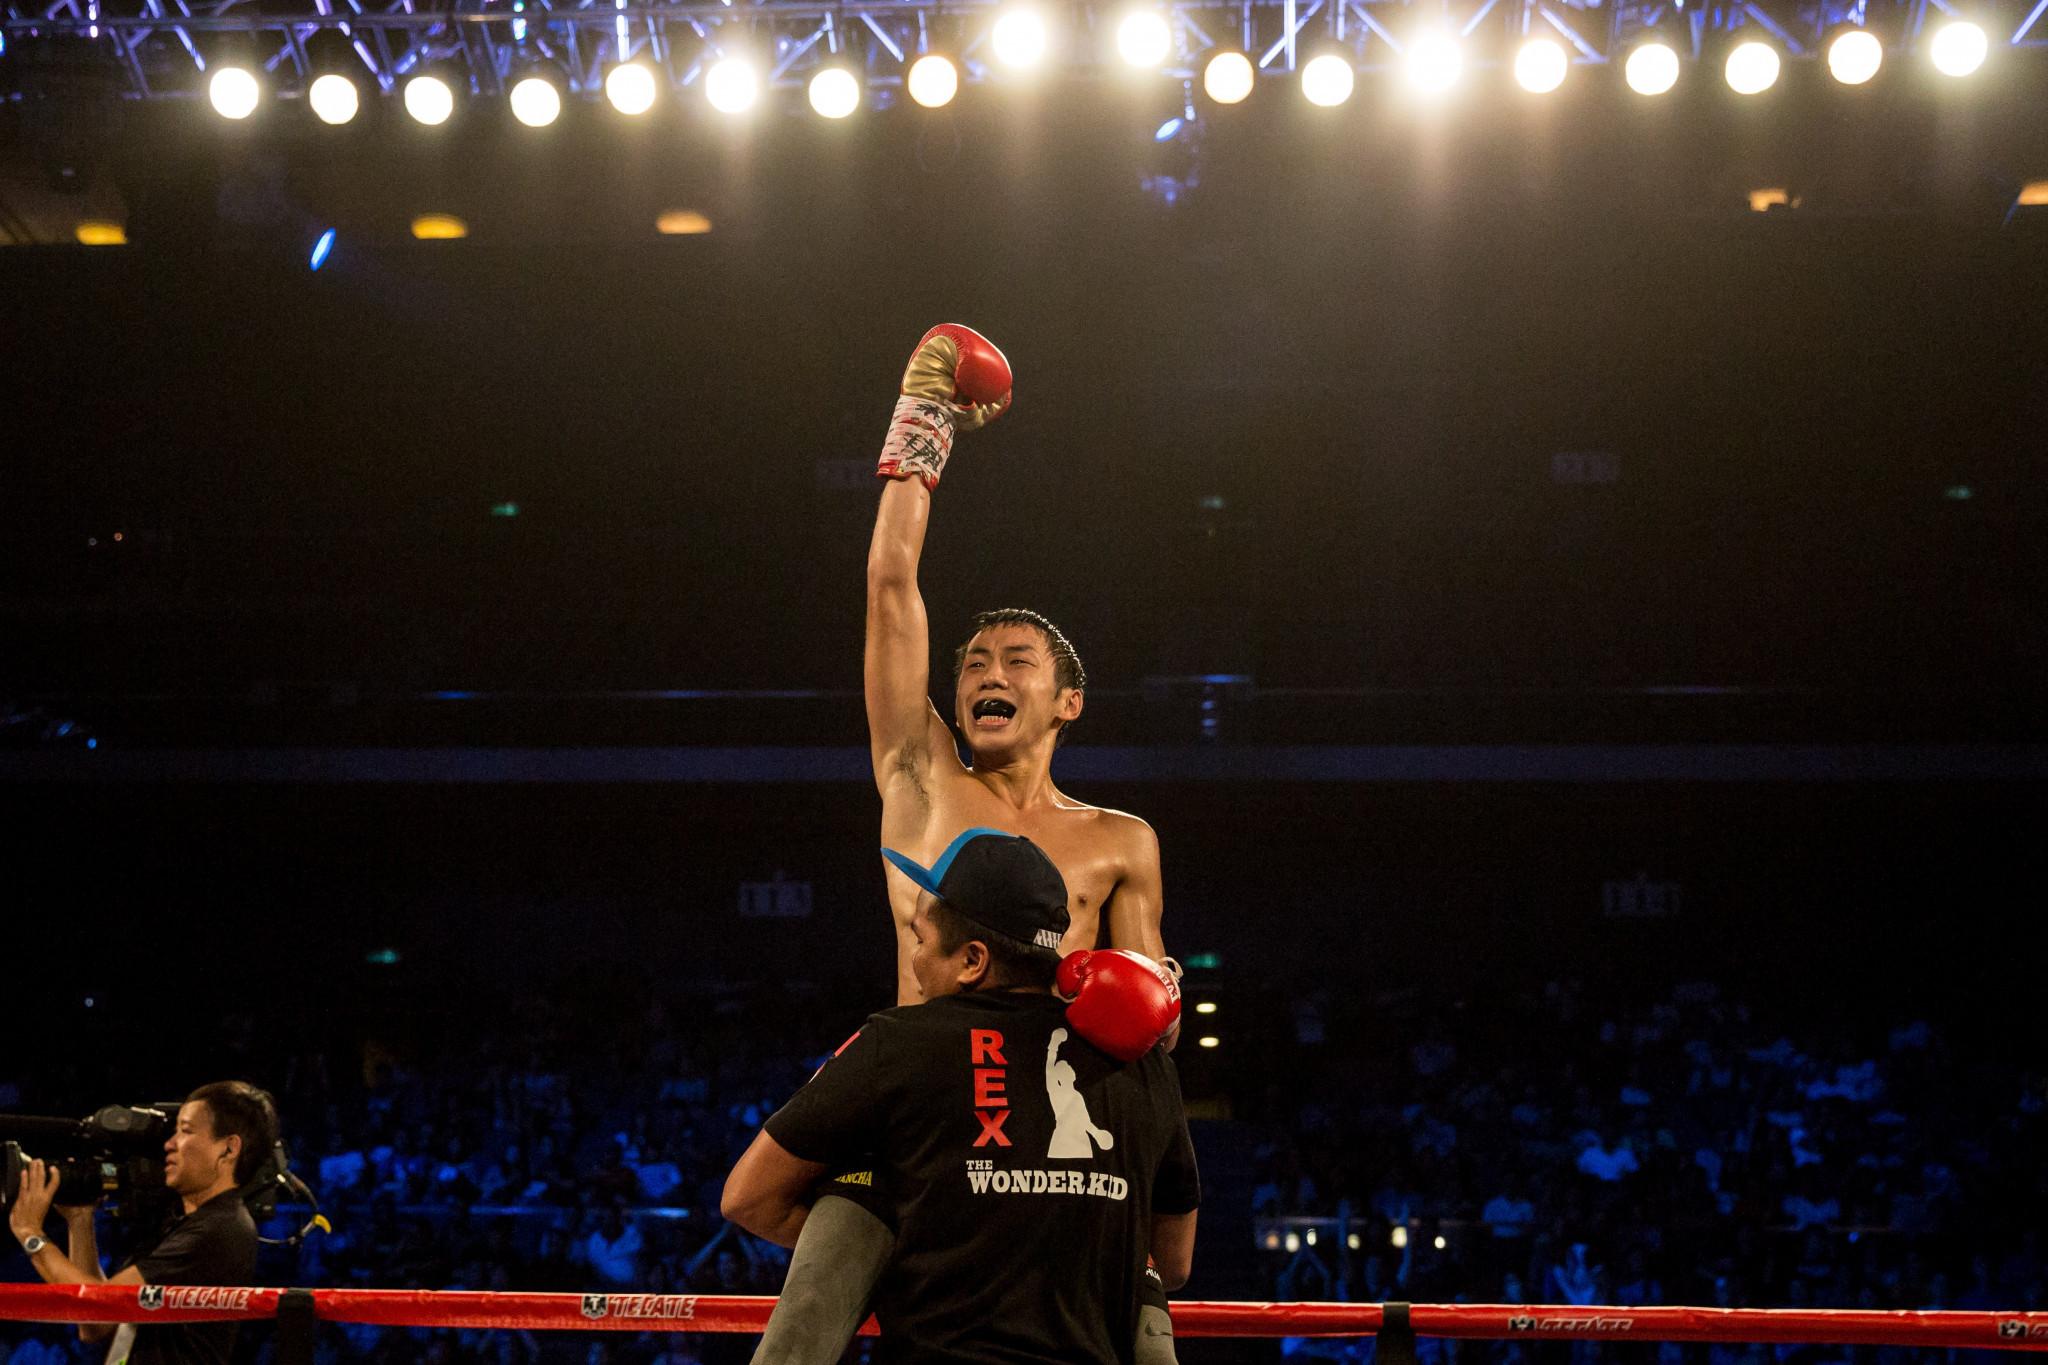 Rex Tso enjoyed an unbeaten 22-fight professional career ©Getty Images